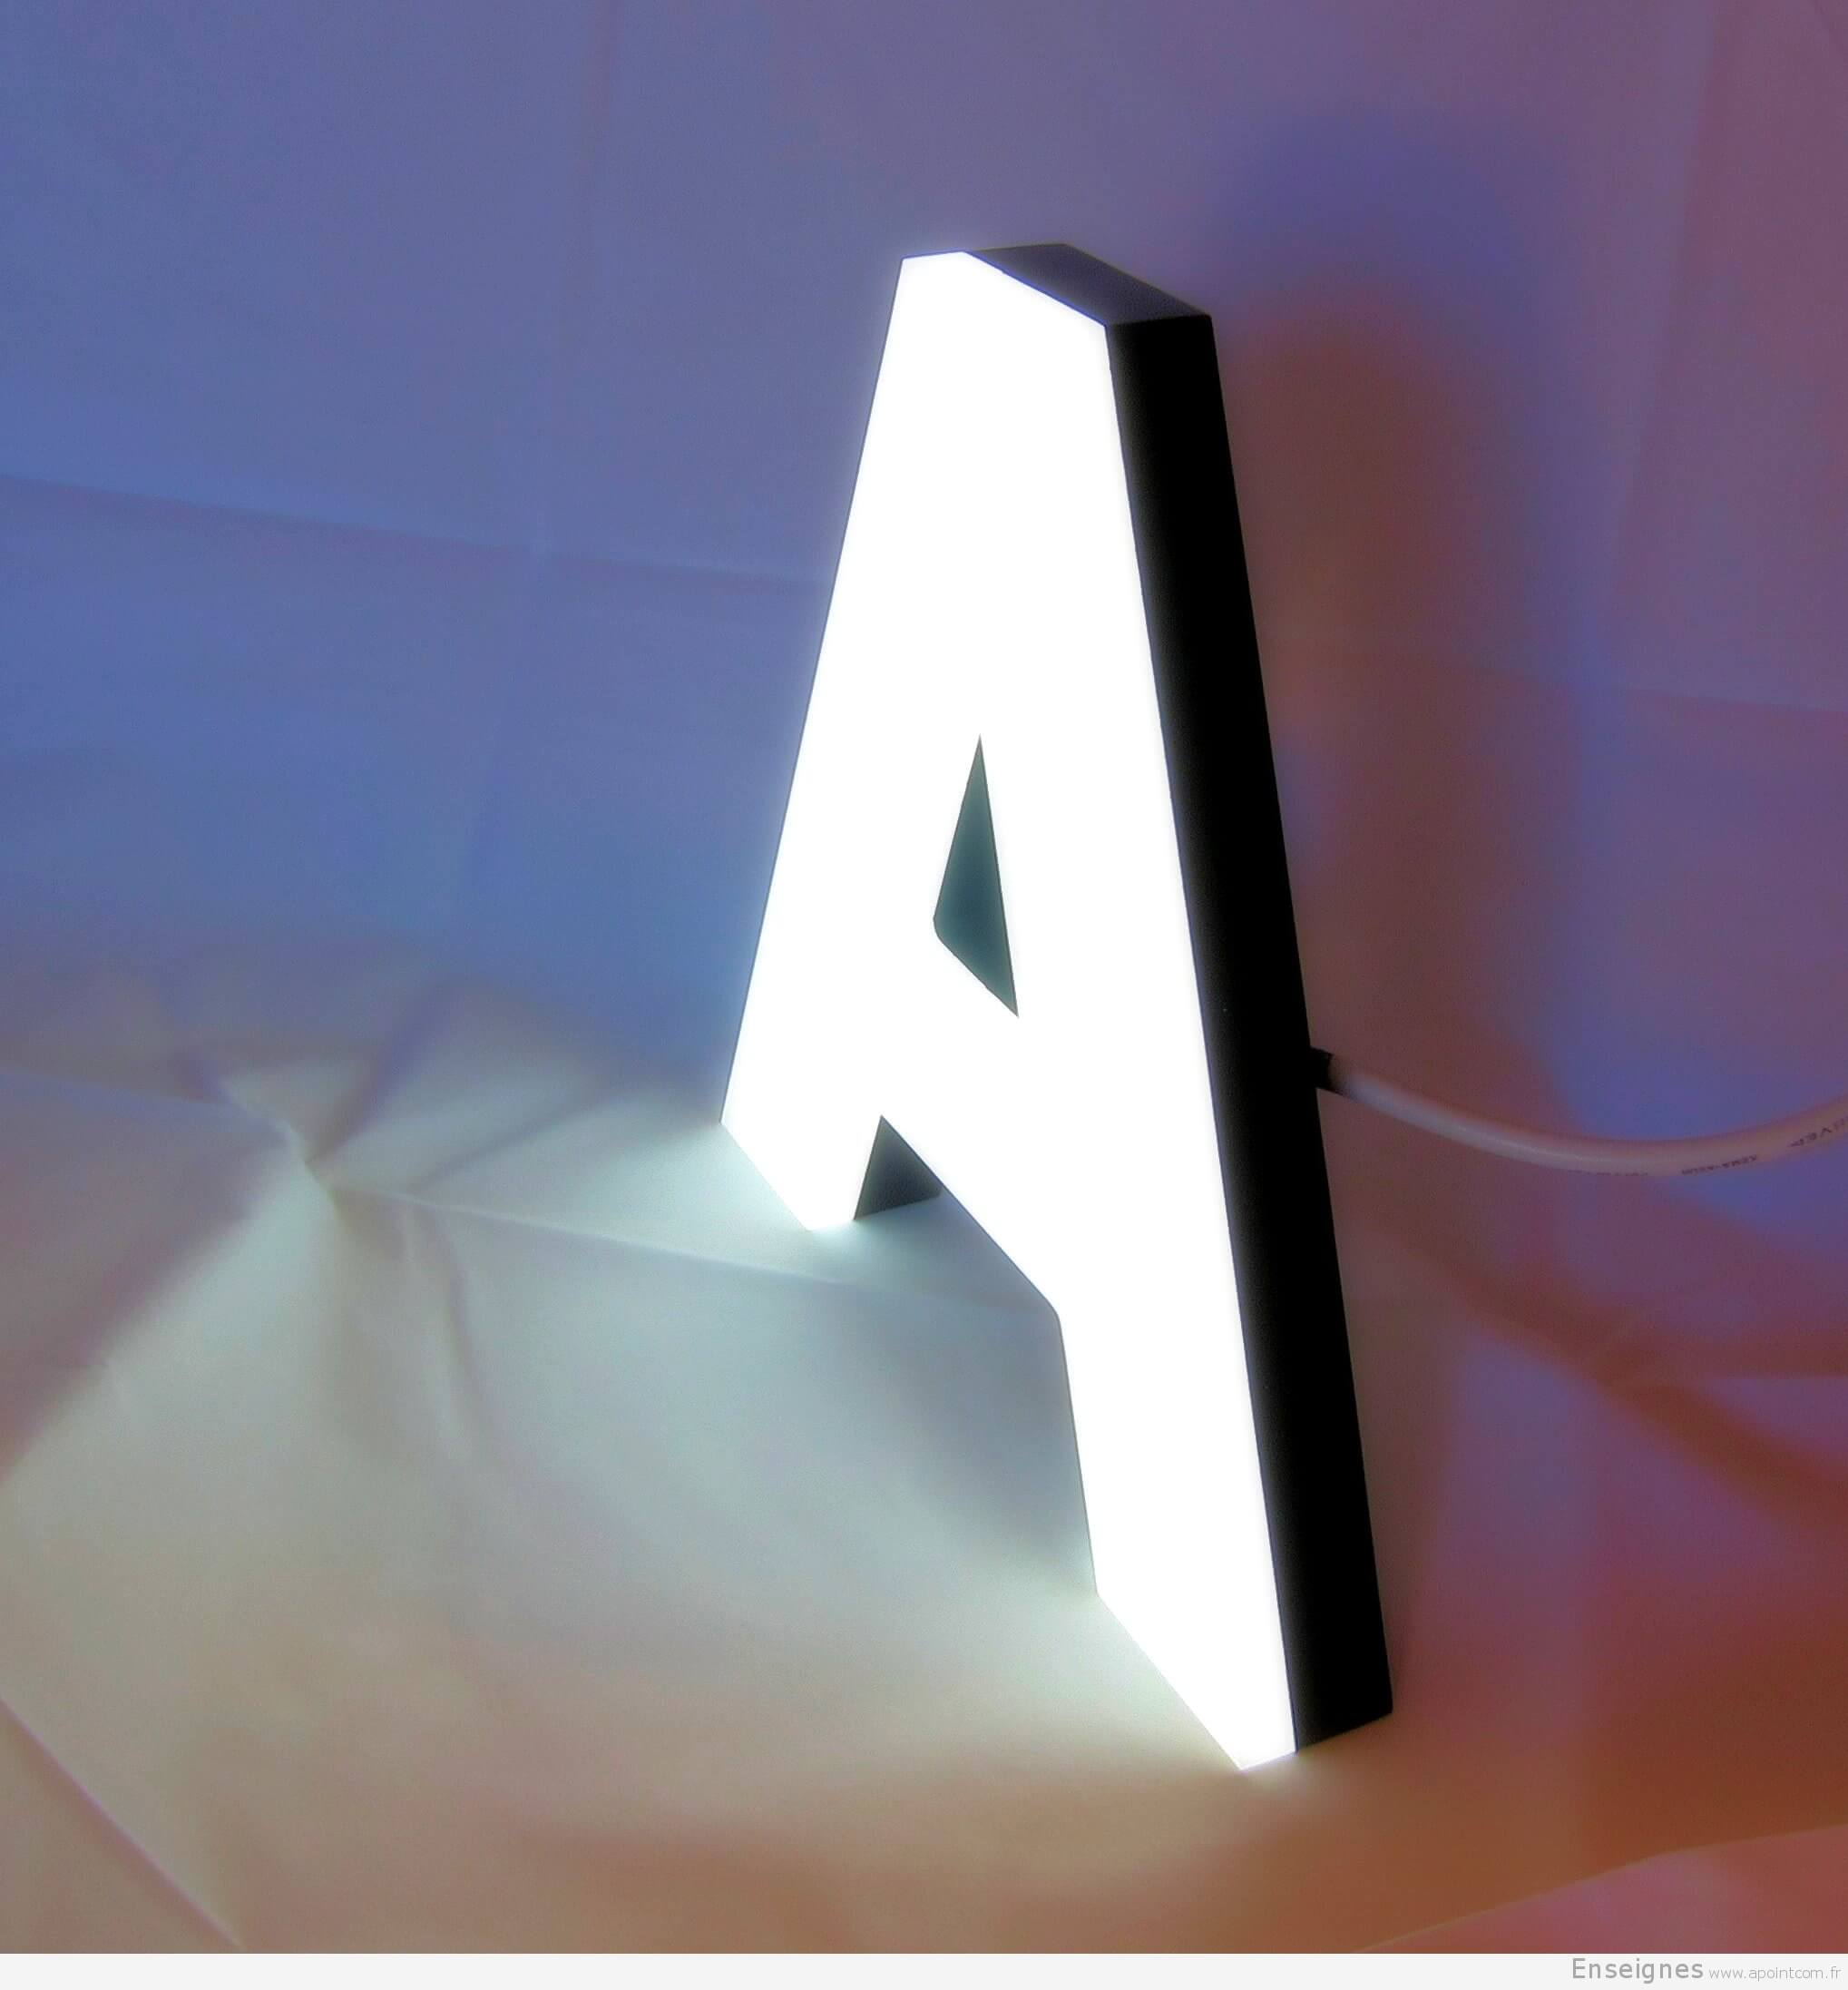 enseigne lumineuse lettres boitier inox plexiglas. Black Bedroom Furniture Sets. Home Design Ideas